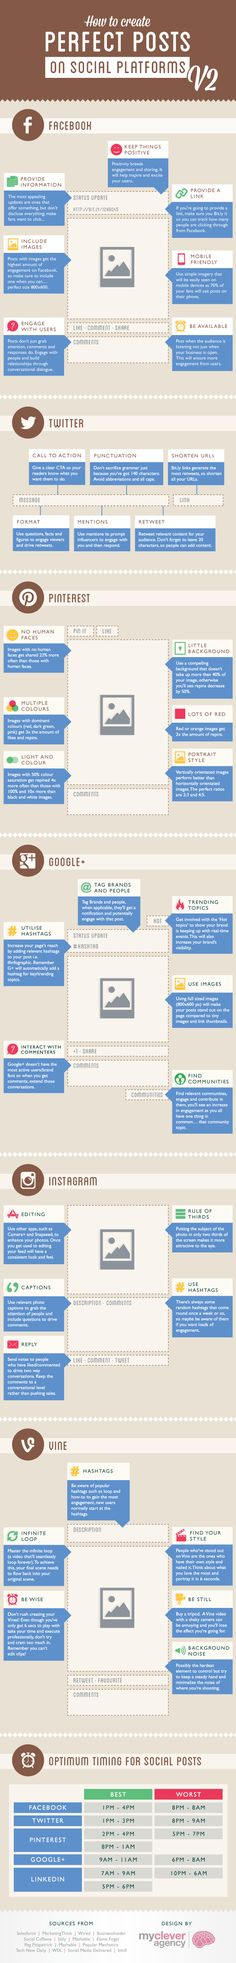 How to plan and create your posts for #social #media updates | http://www.krishna.me/2013/tips-for-social-media-posts-infographic/?utm_content=buffercf825&utm_medium=social&utm_source=pinterest.com&utm_campaign=buffer#_a5y_p=984327 | via 83oranges.com